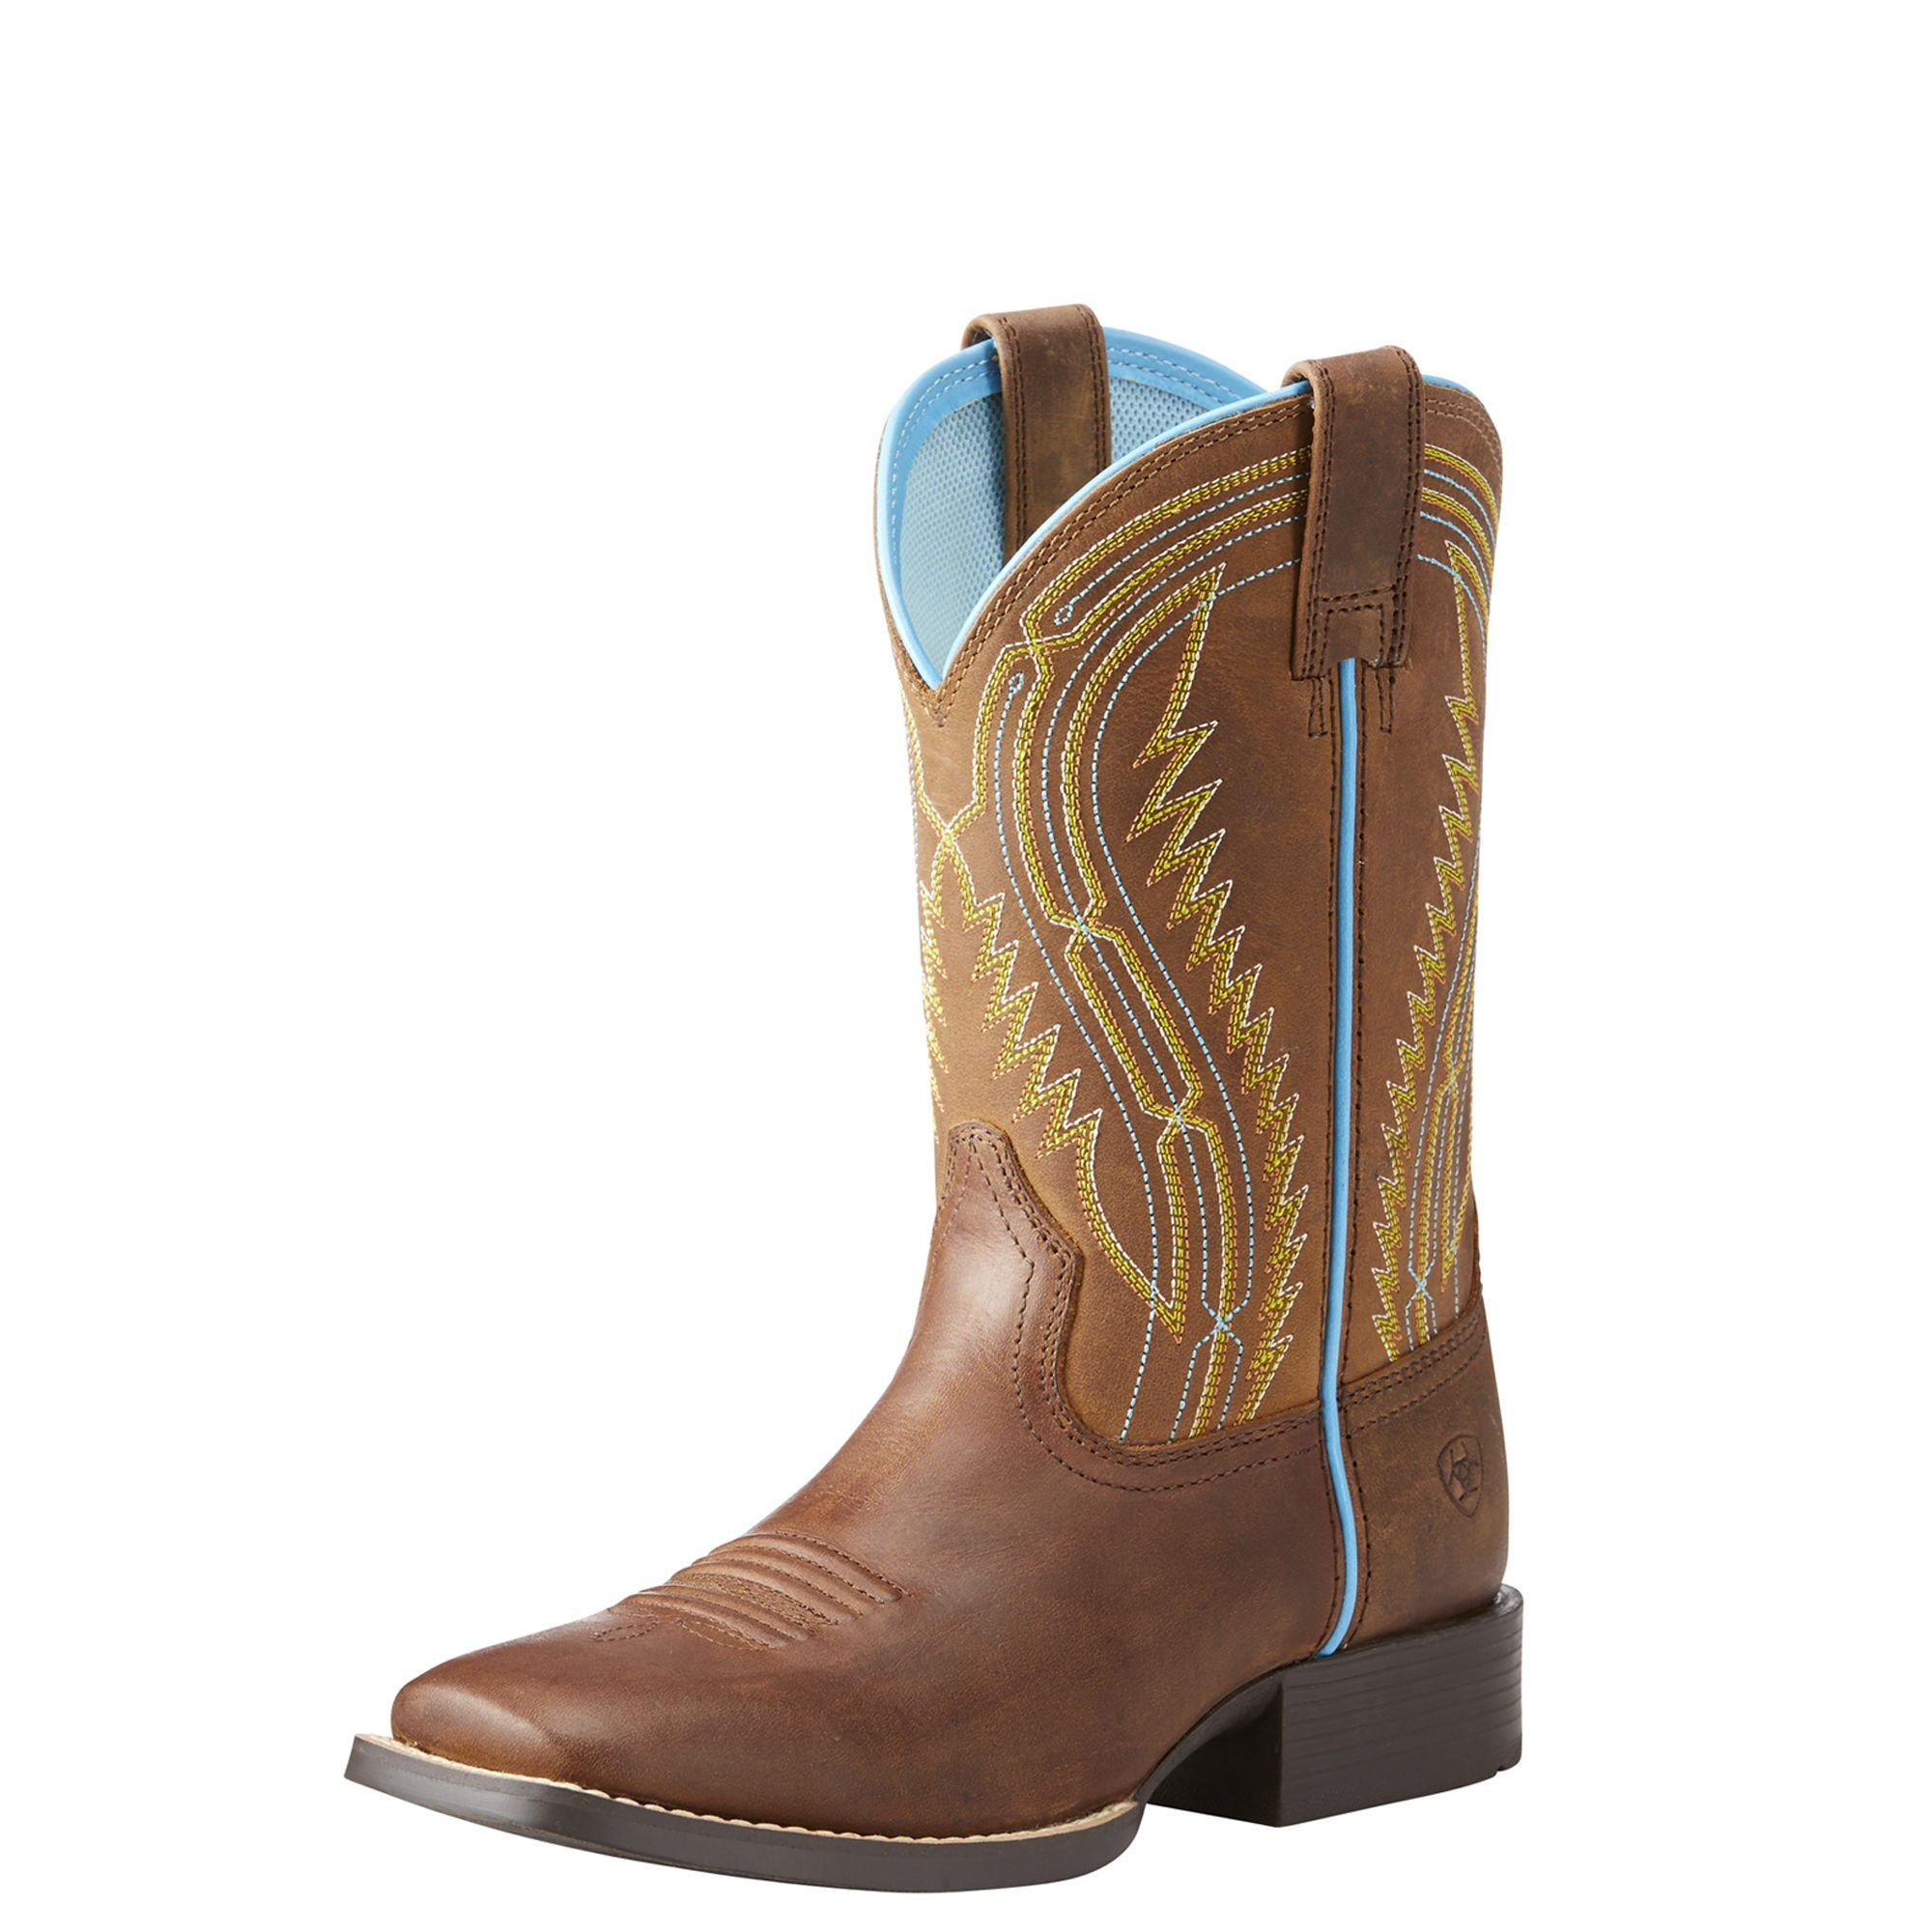 Kids' Chute Boss Western Boot, Distressed Brown, 2.5 M US Little Kid